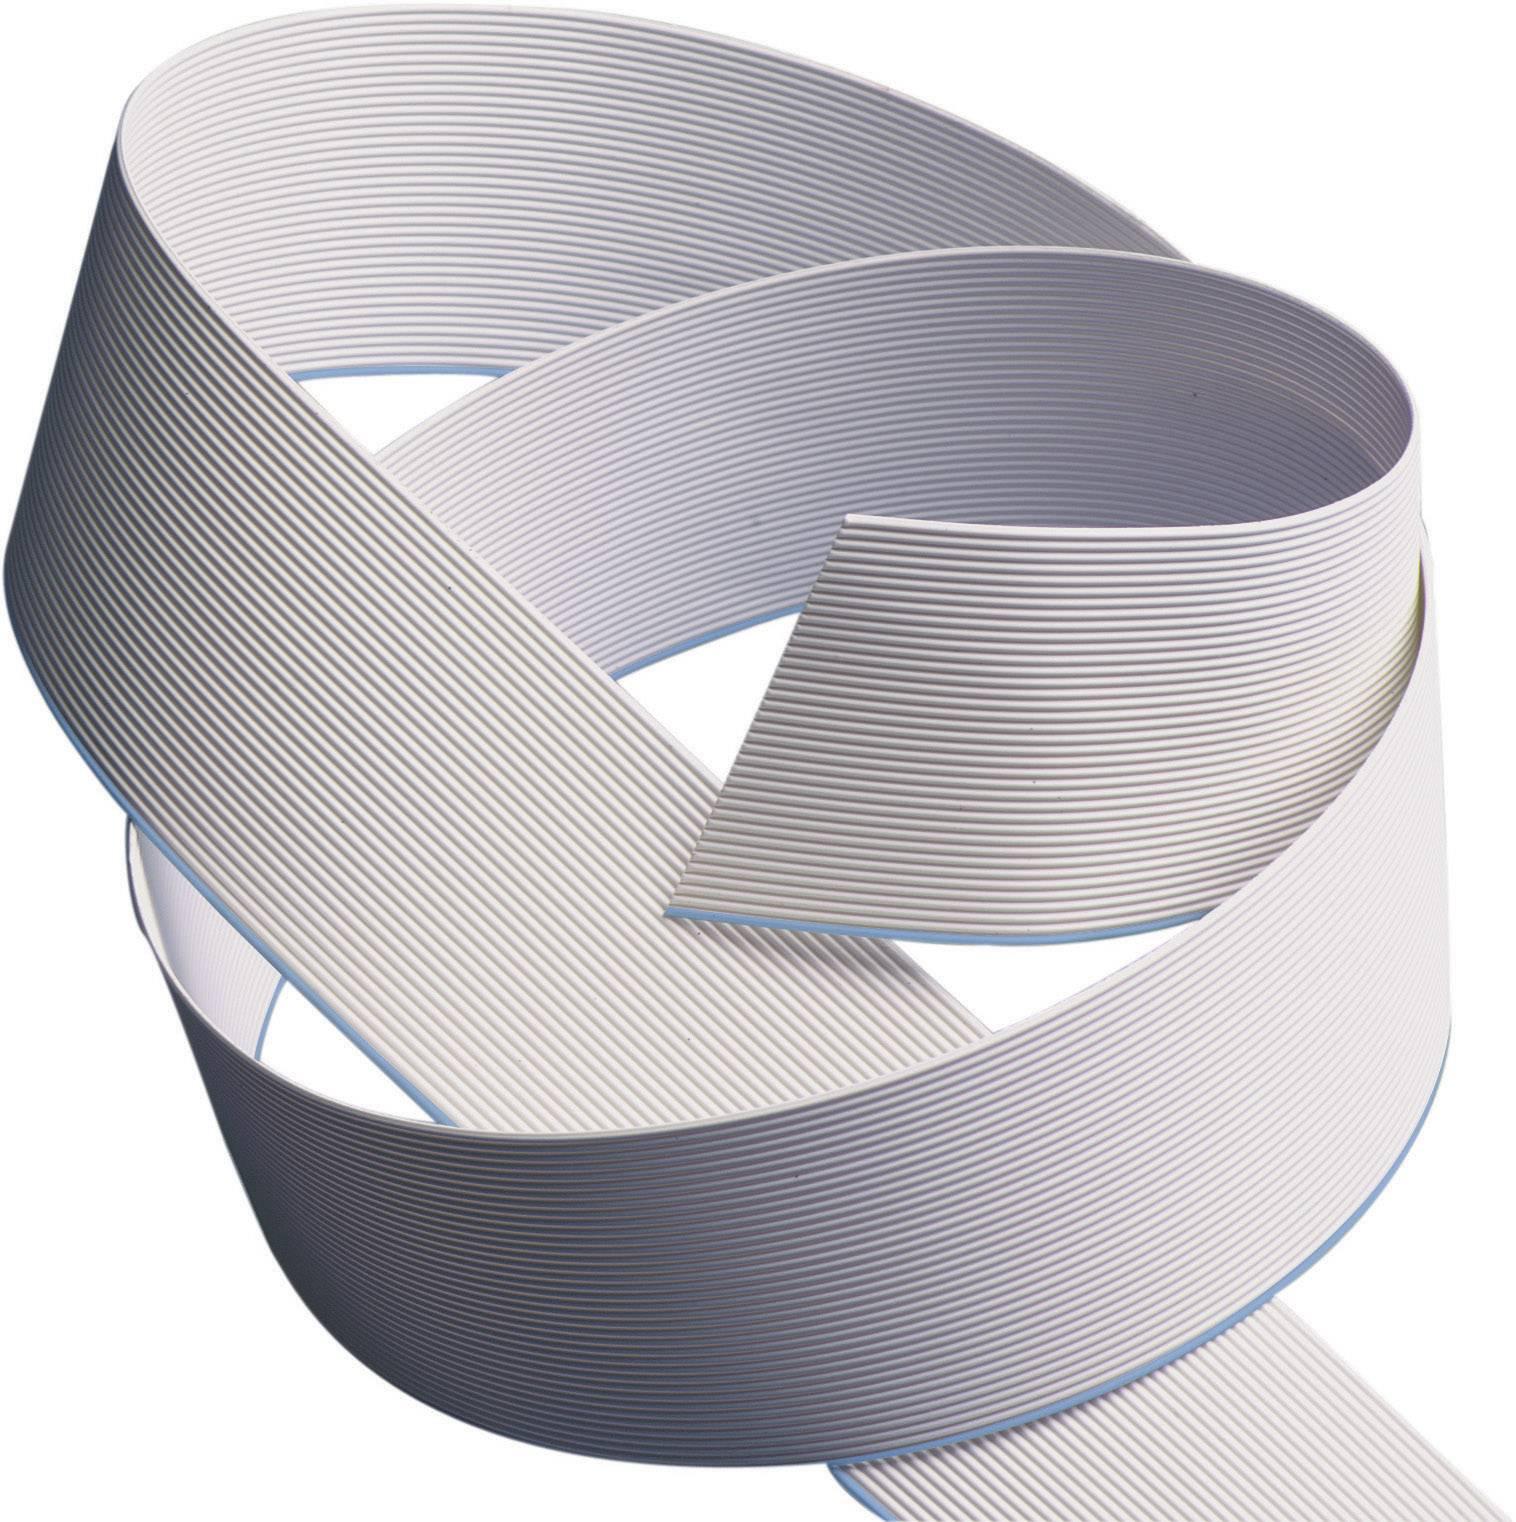 Plochý kábel 3M 7000057375, rozteč 1.27 mm, 40 x 0.08 mm², sivá, metrový tovar